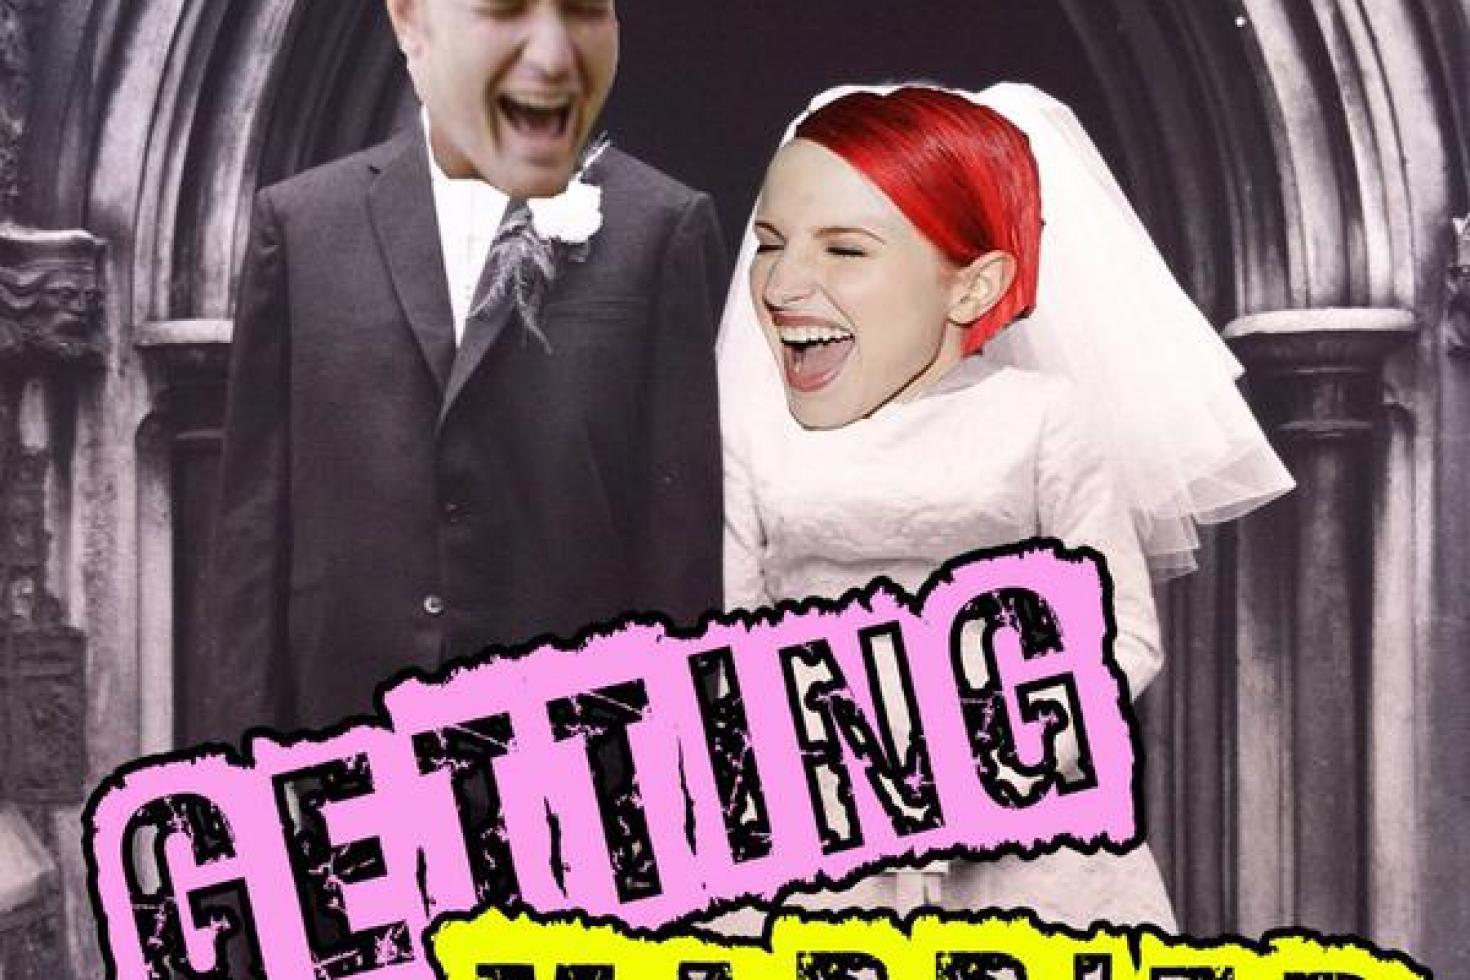 Hayley williams dating chad gilbert